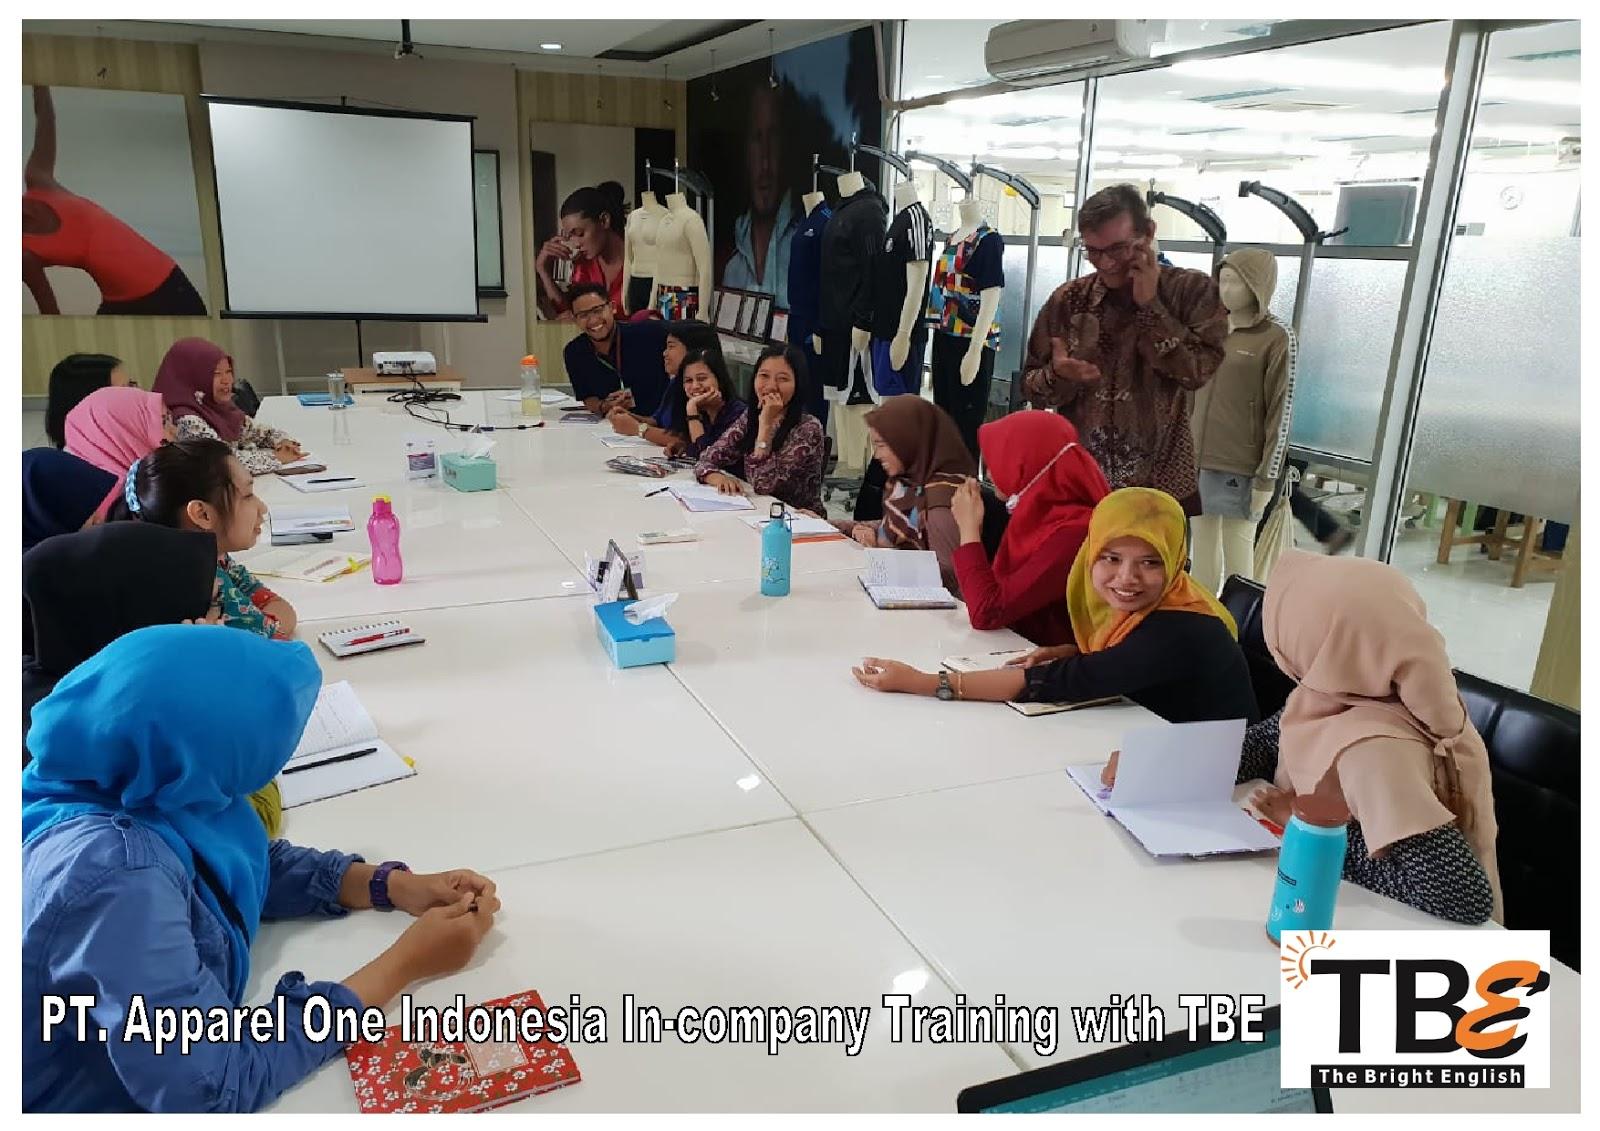 LOKER: PT. Apparrel One Indonesia (Hubungi CP segera)